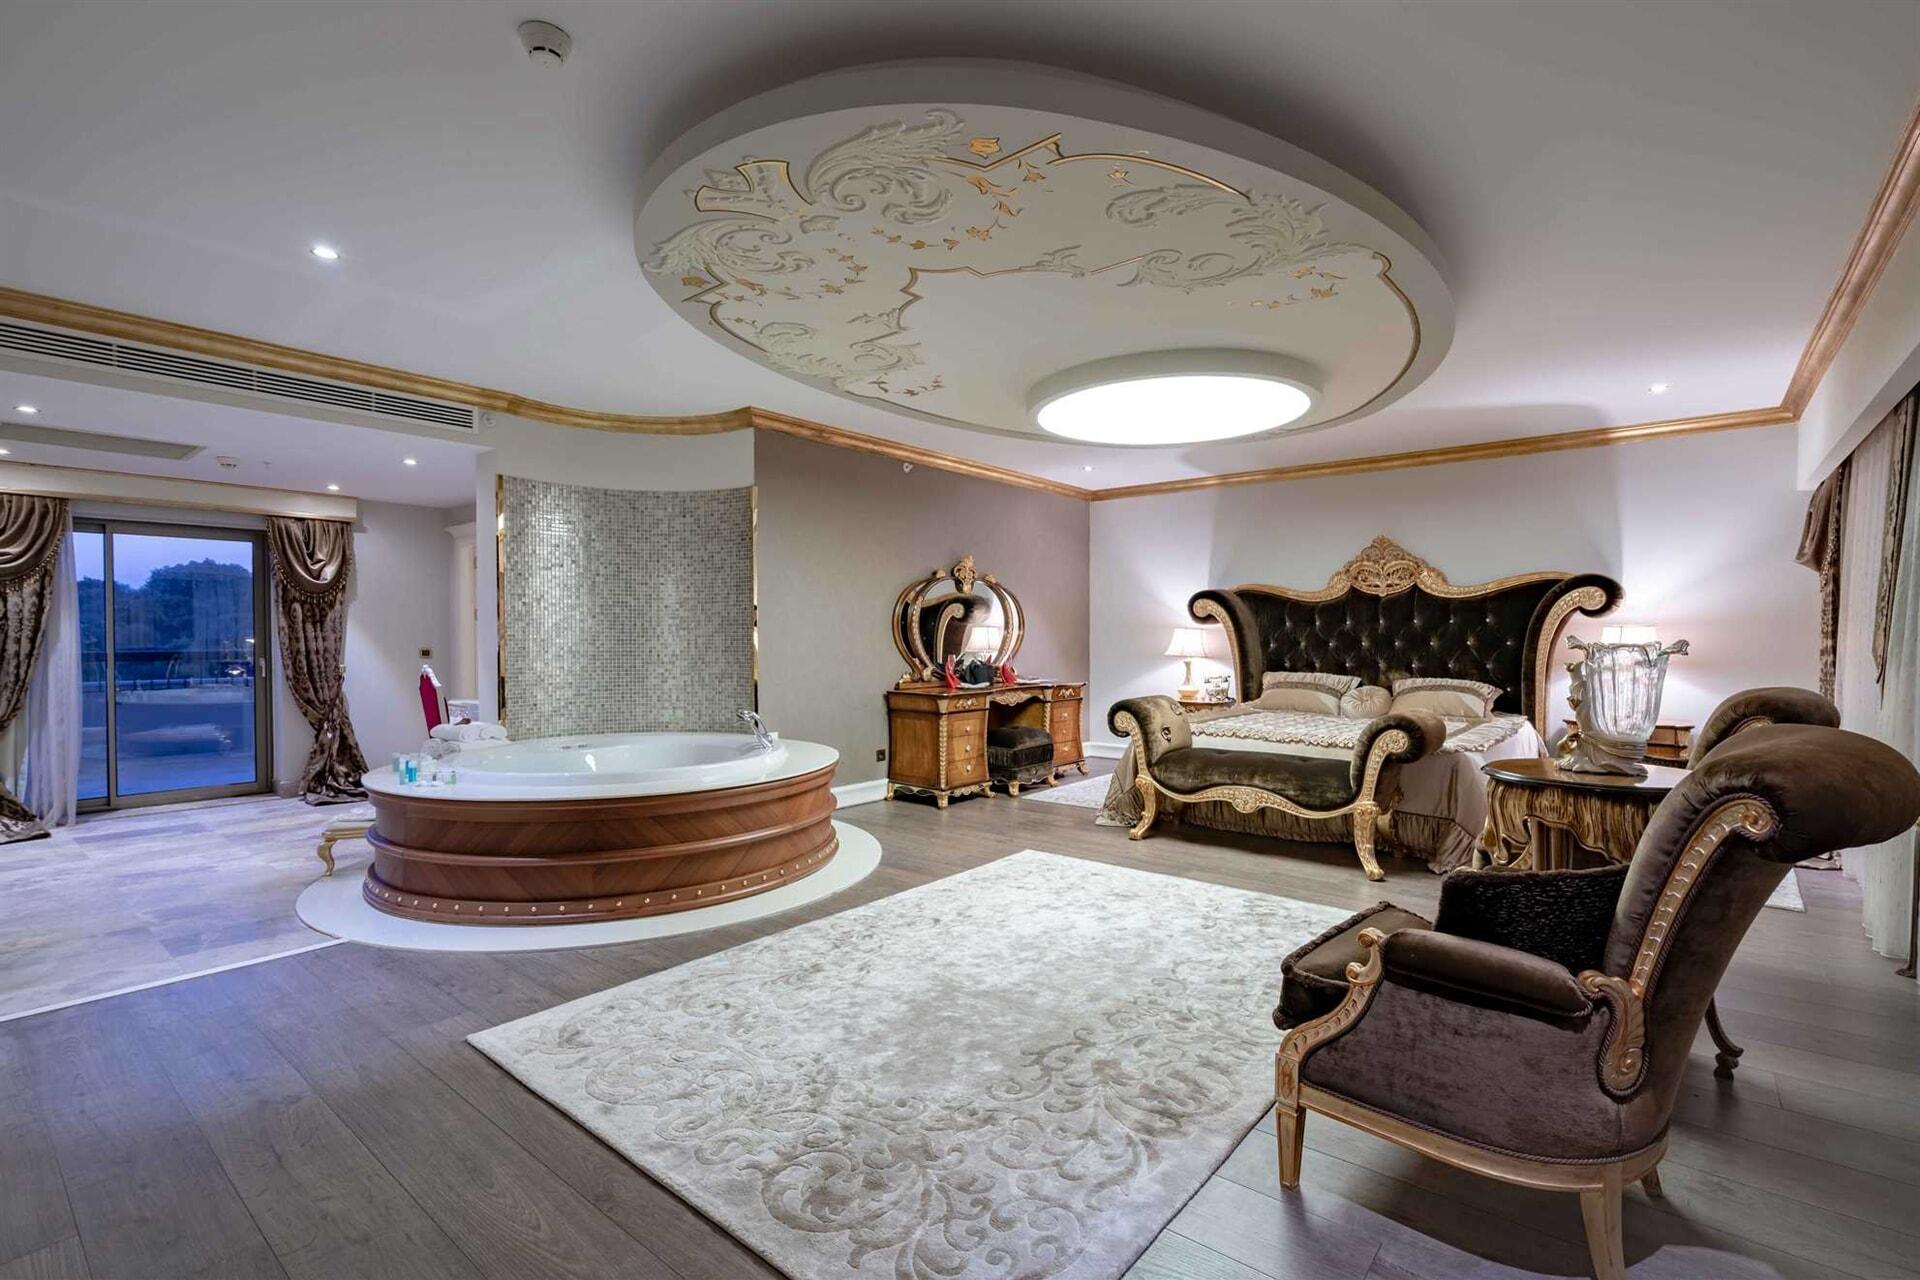 EUPHORIA AEGEAN RESORT AND THERMAL HOTEL – King Suite